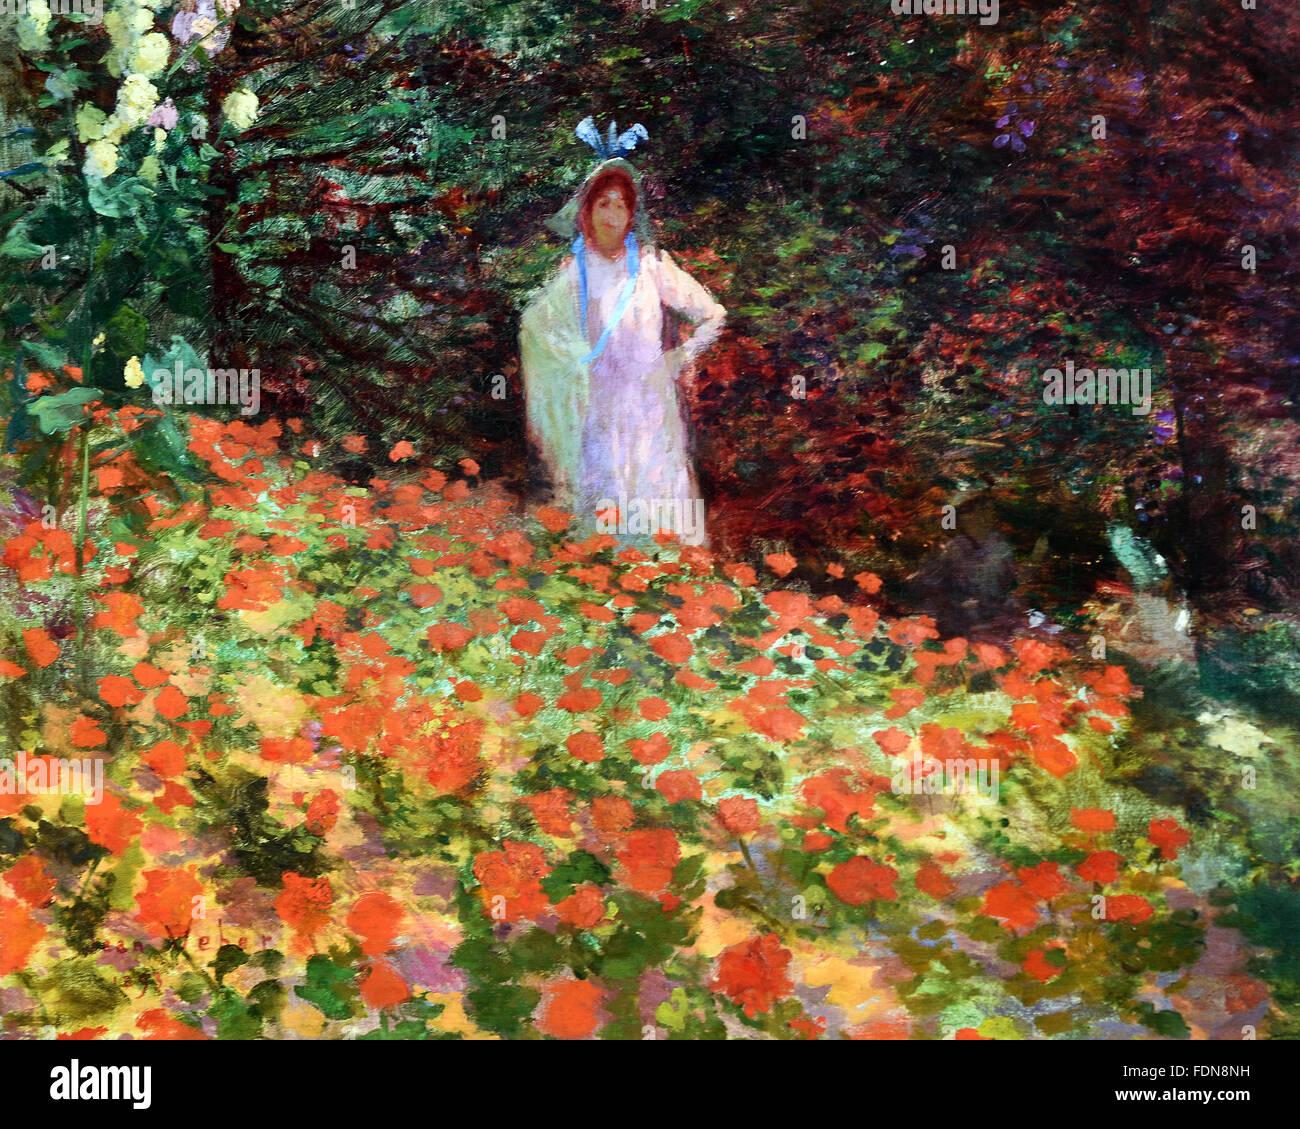 Jeune Femme Dans un Jardin Fleuri - junge Frau in einem Blumengarten ...